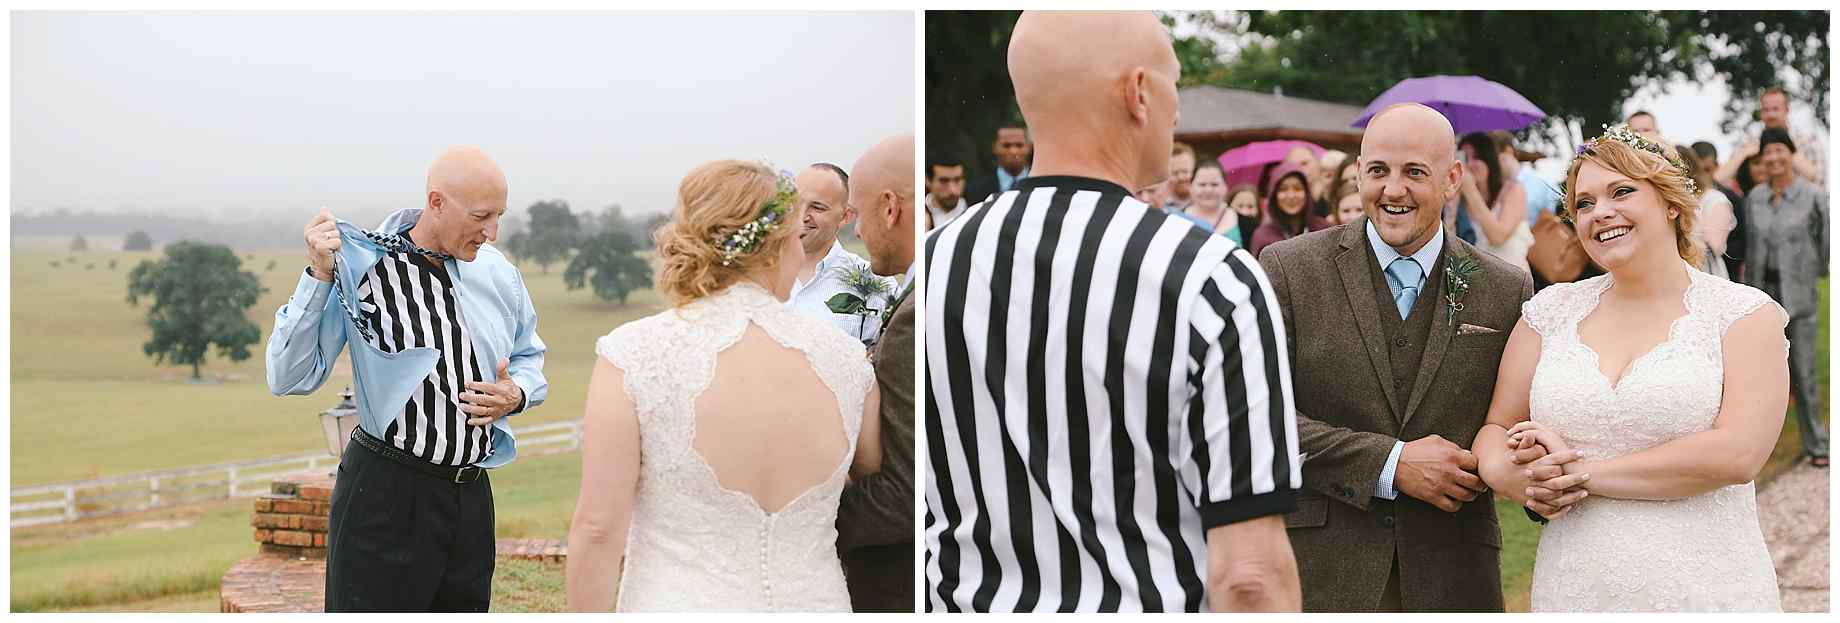 palestine-tx-wedding-photography-019